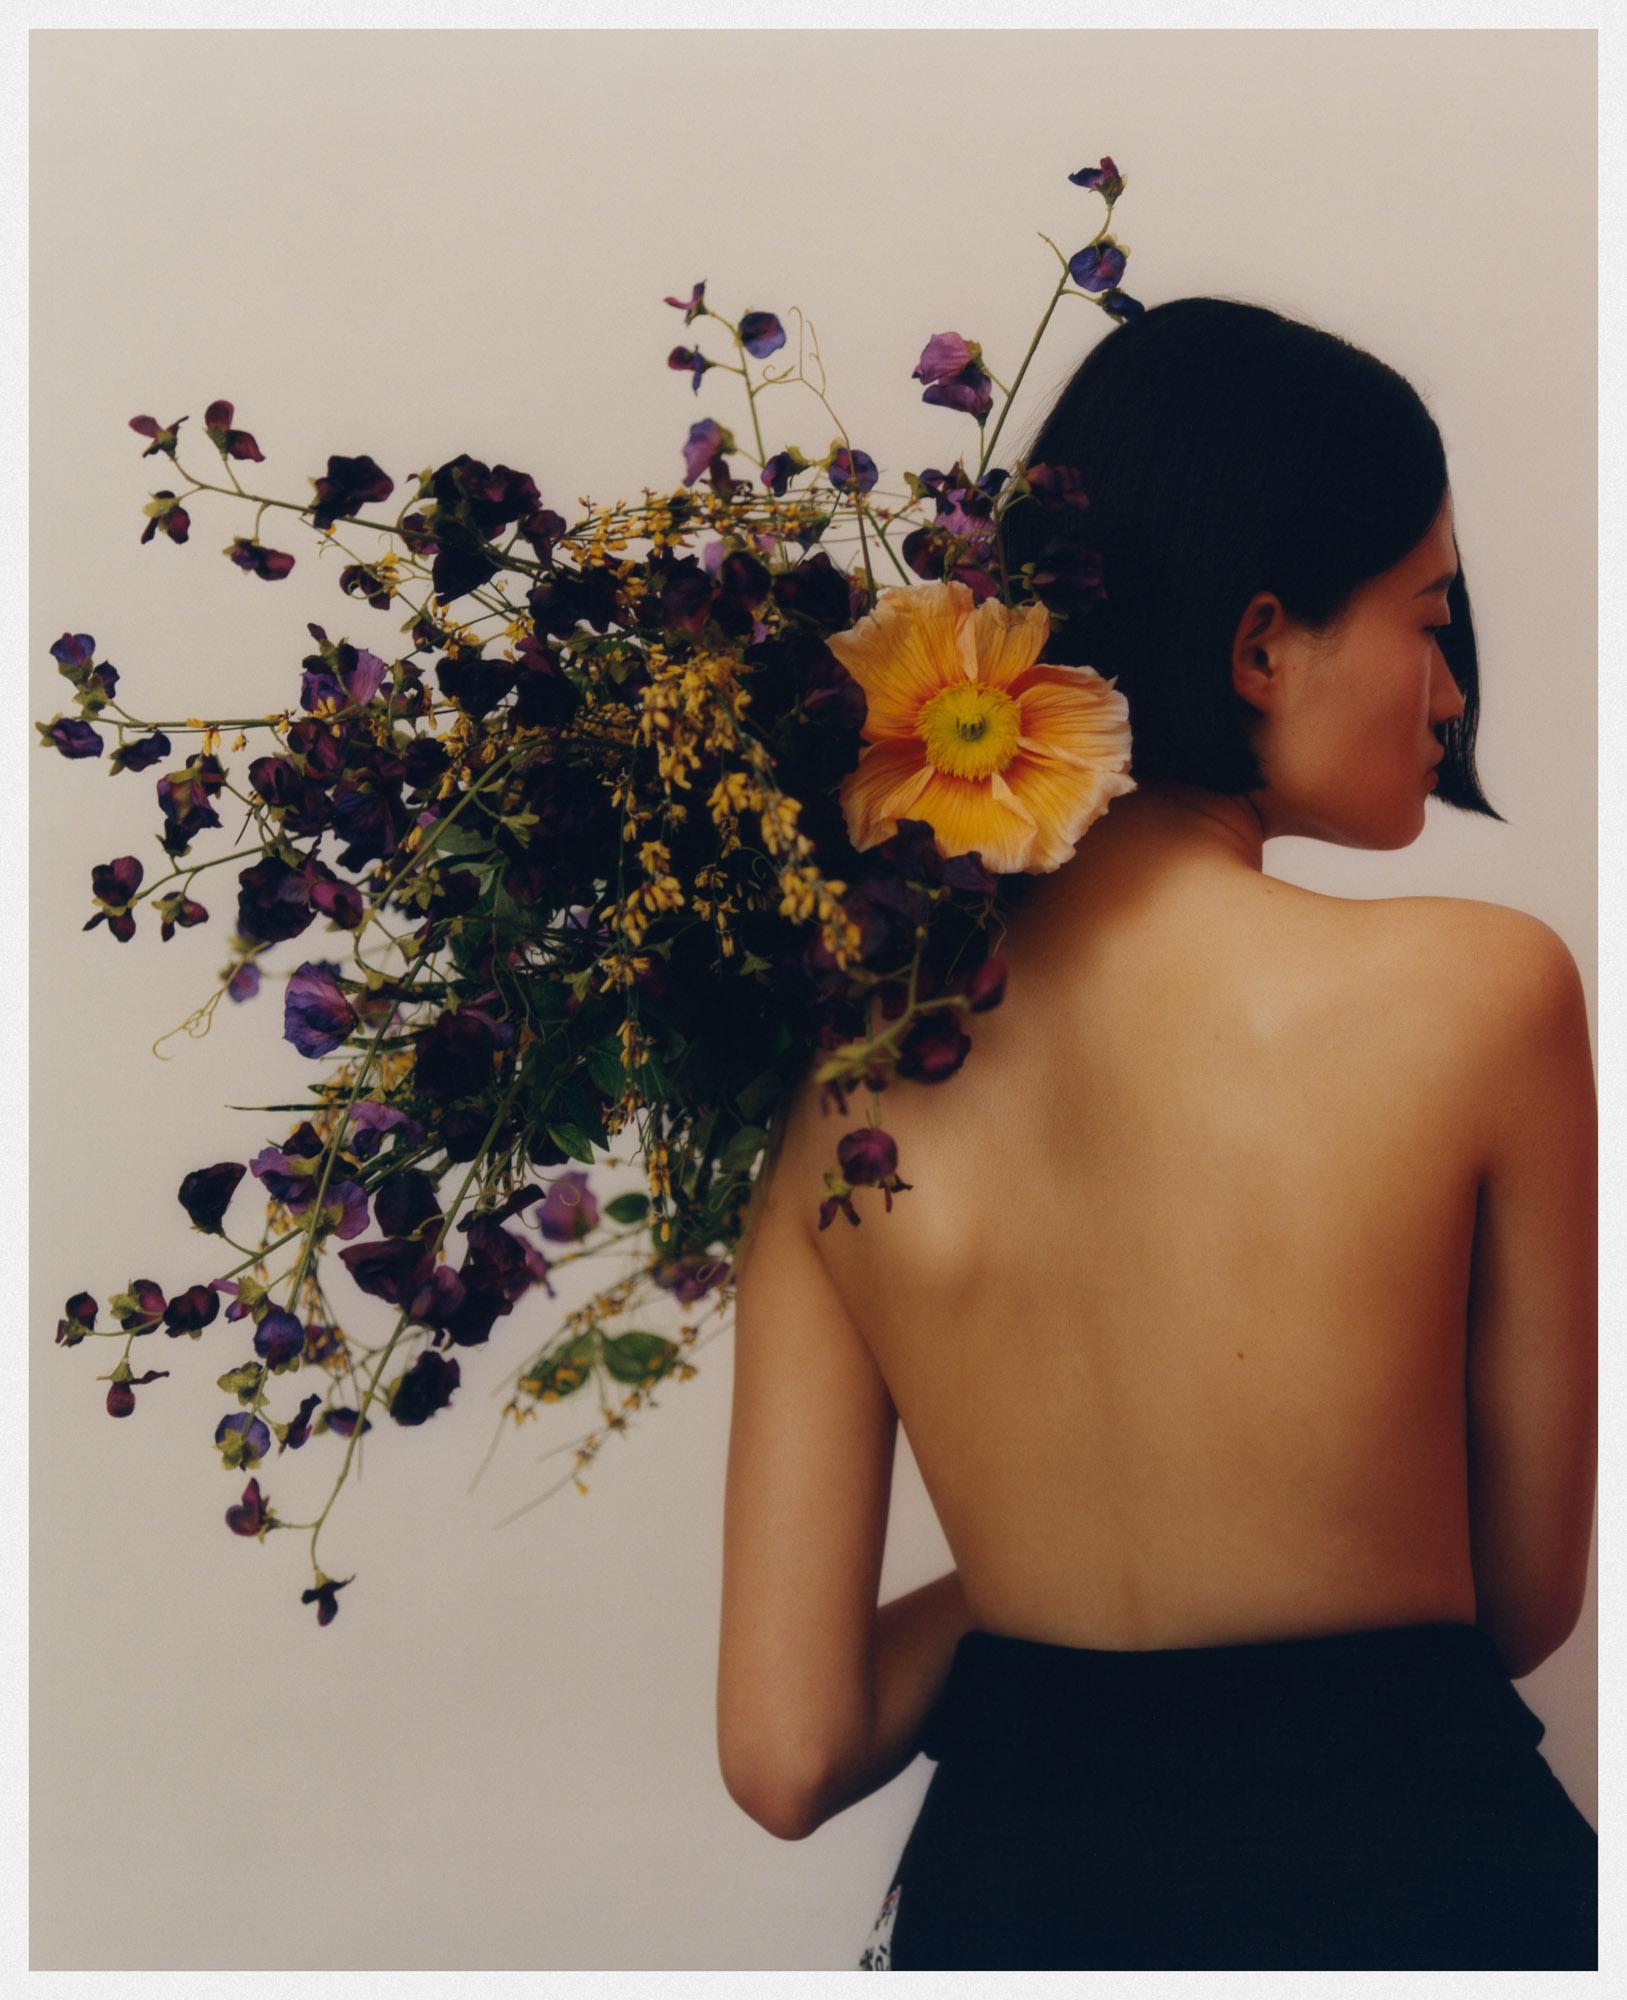 Claudia_De-Meis-88.jpg